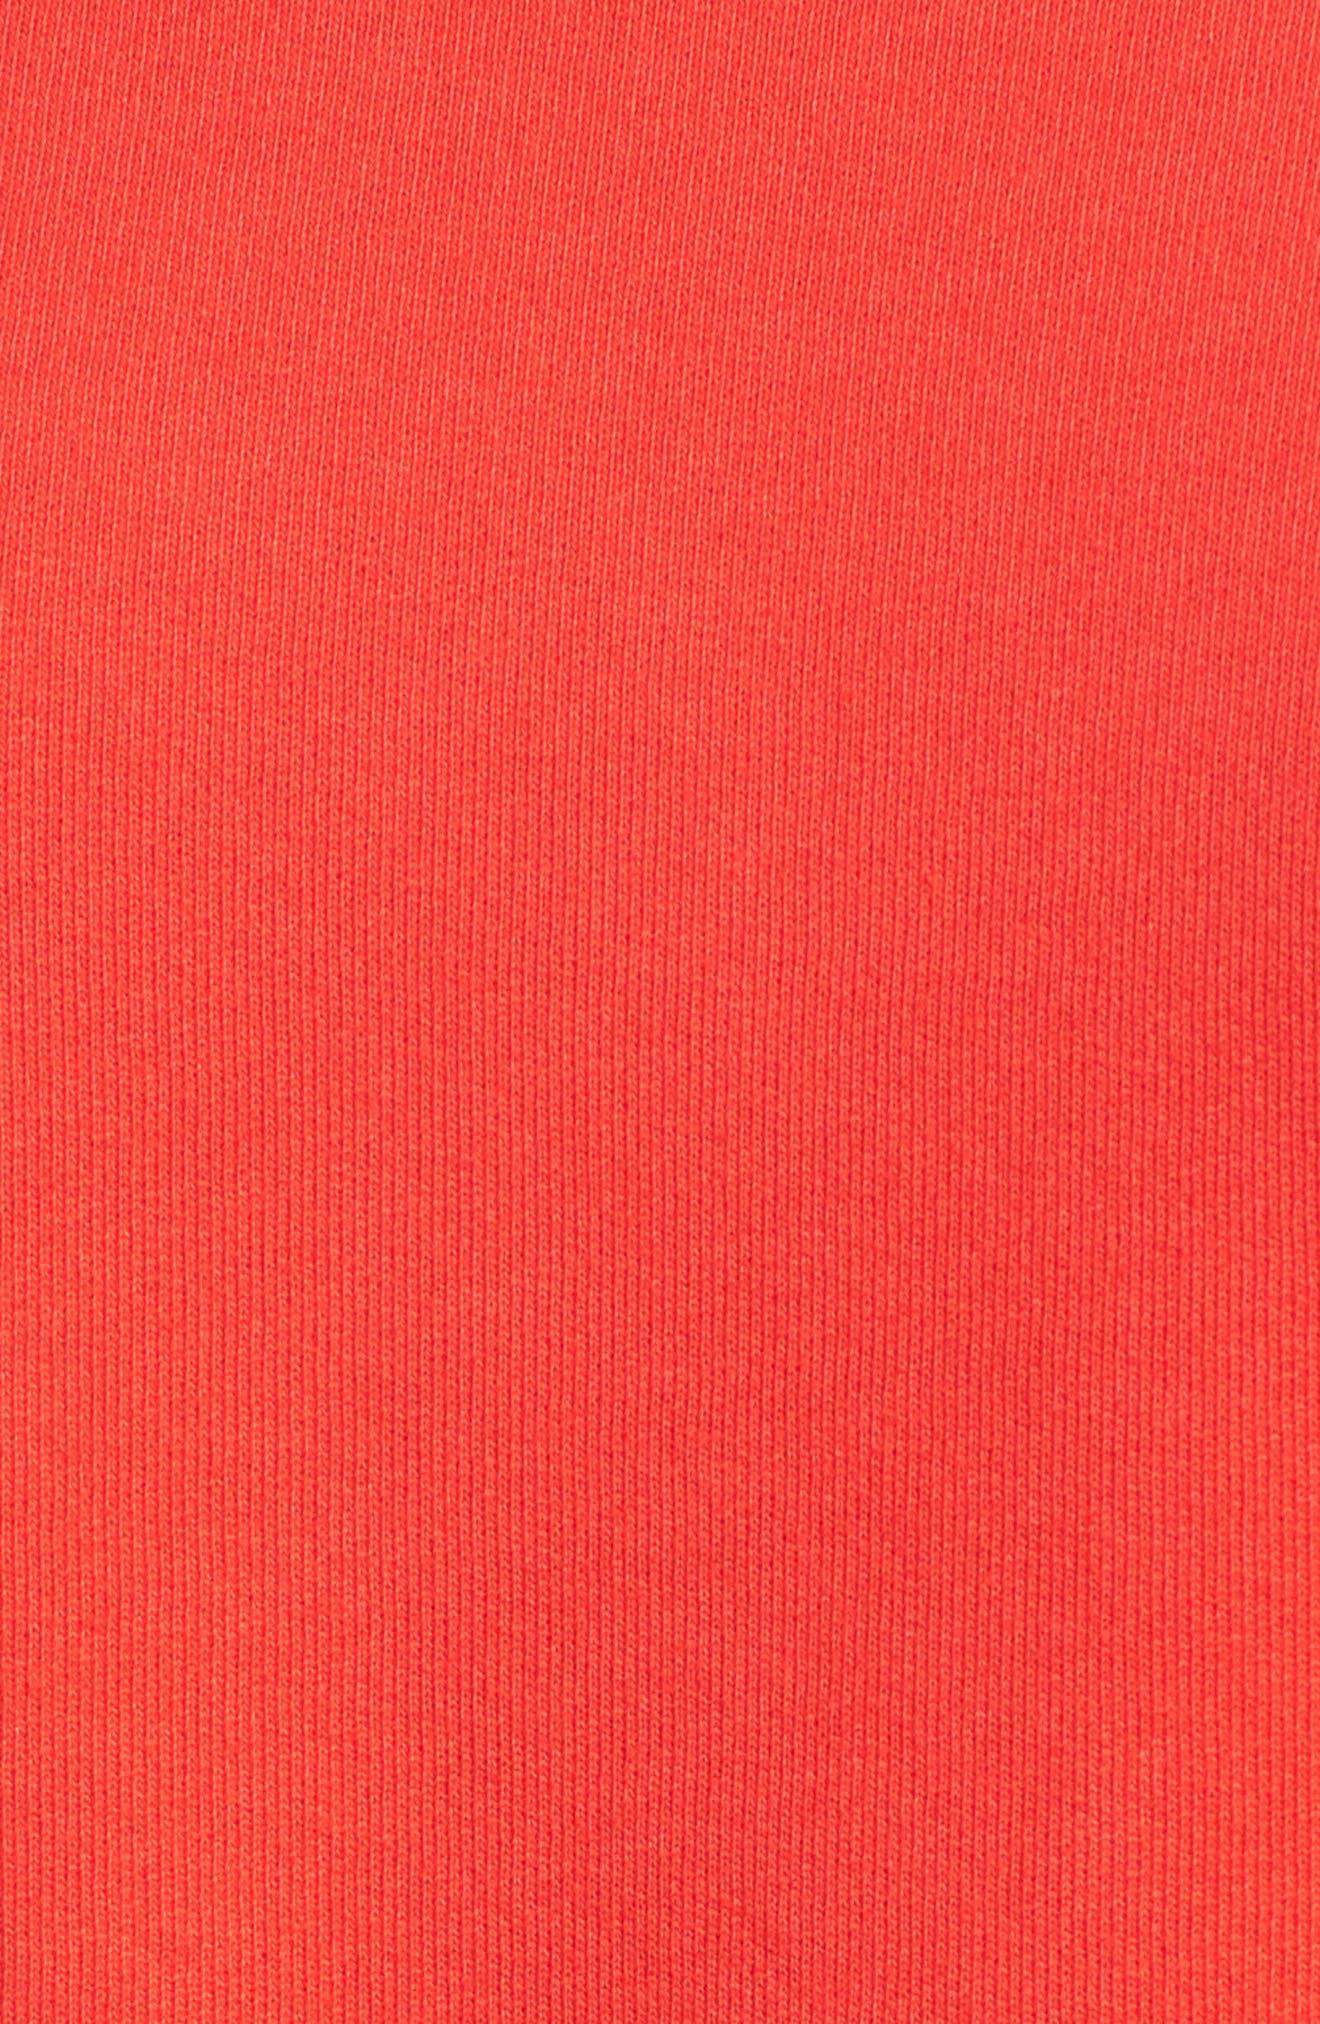 FRANK & EILEEN TEE LAB,                             Distressed Sweatshirt,                             Alternate thumbnail 5, color,                             624